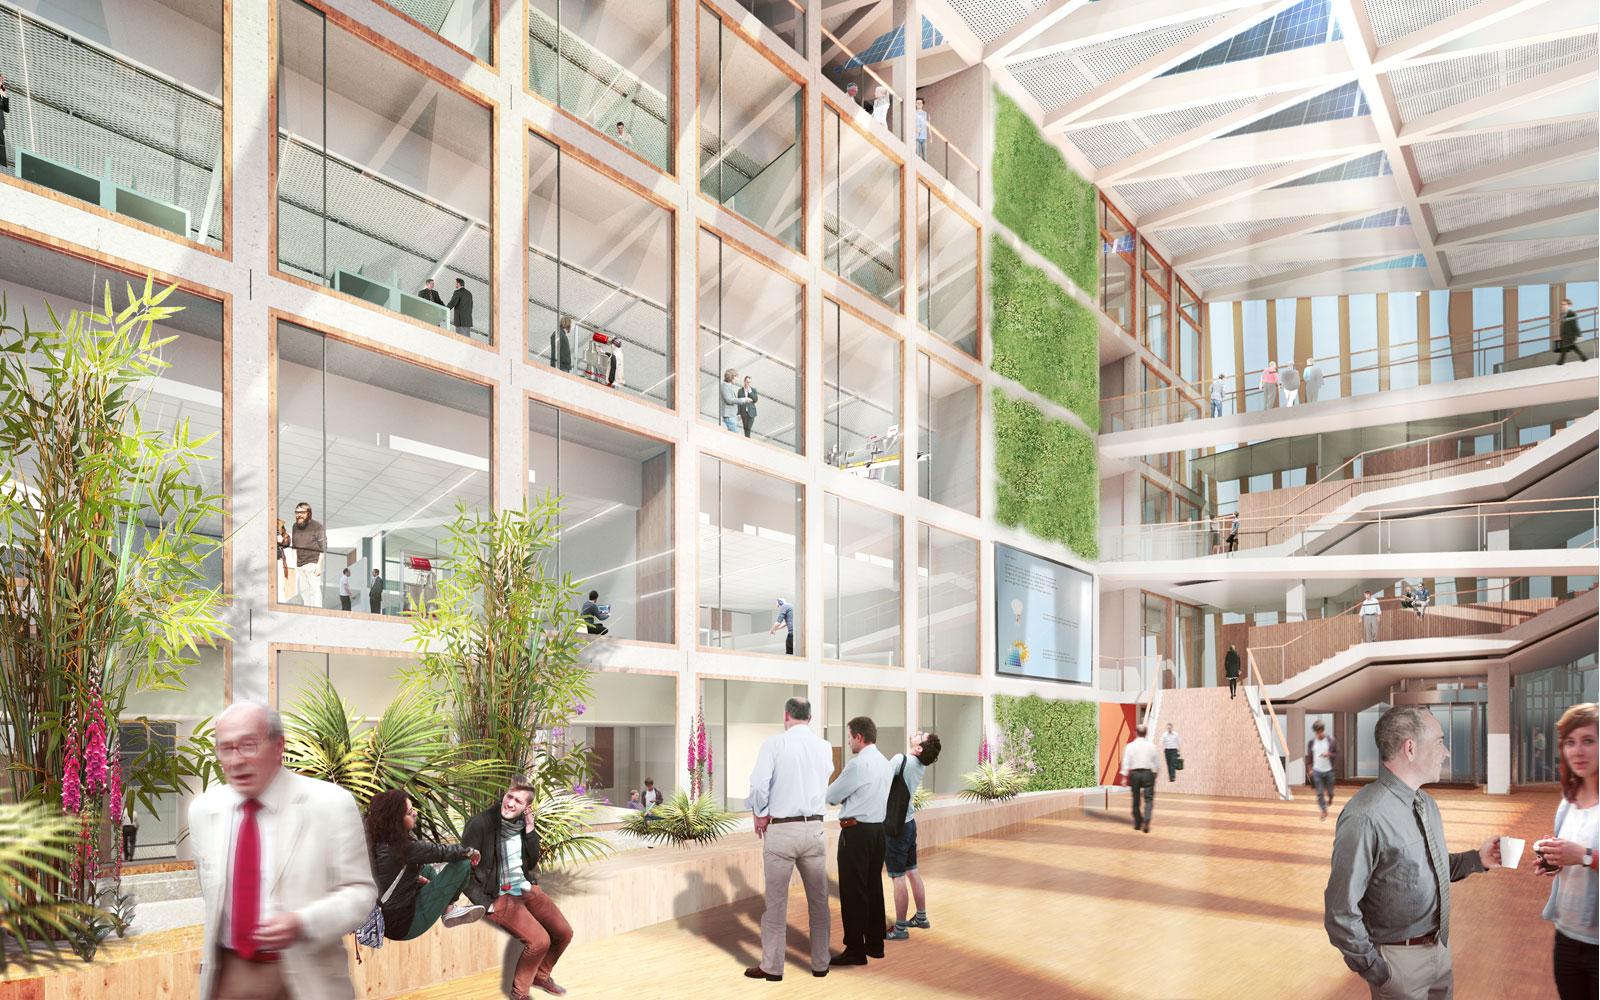 Bouwstart Energy Academy Broekbakema en pvanb architecten